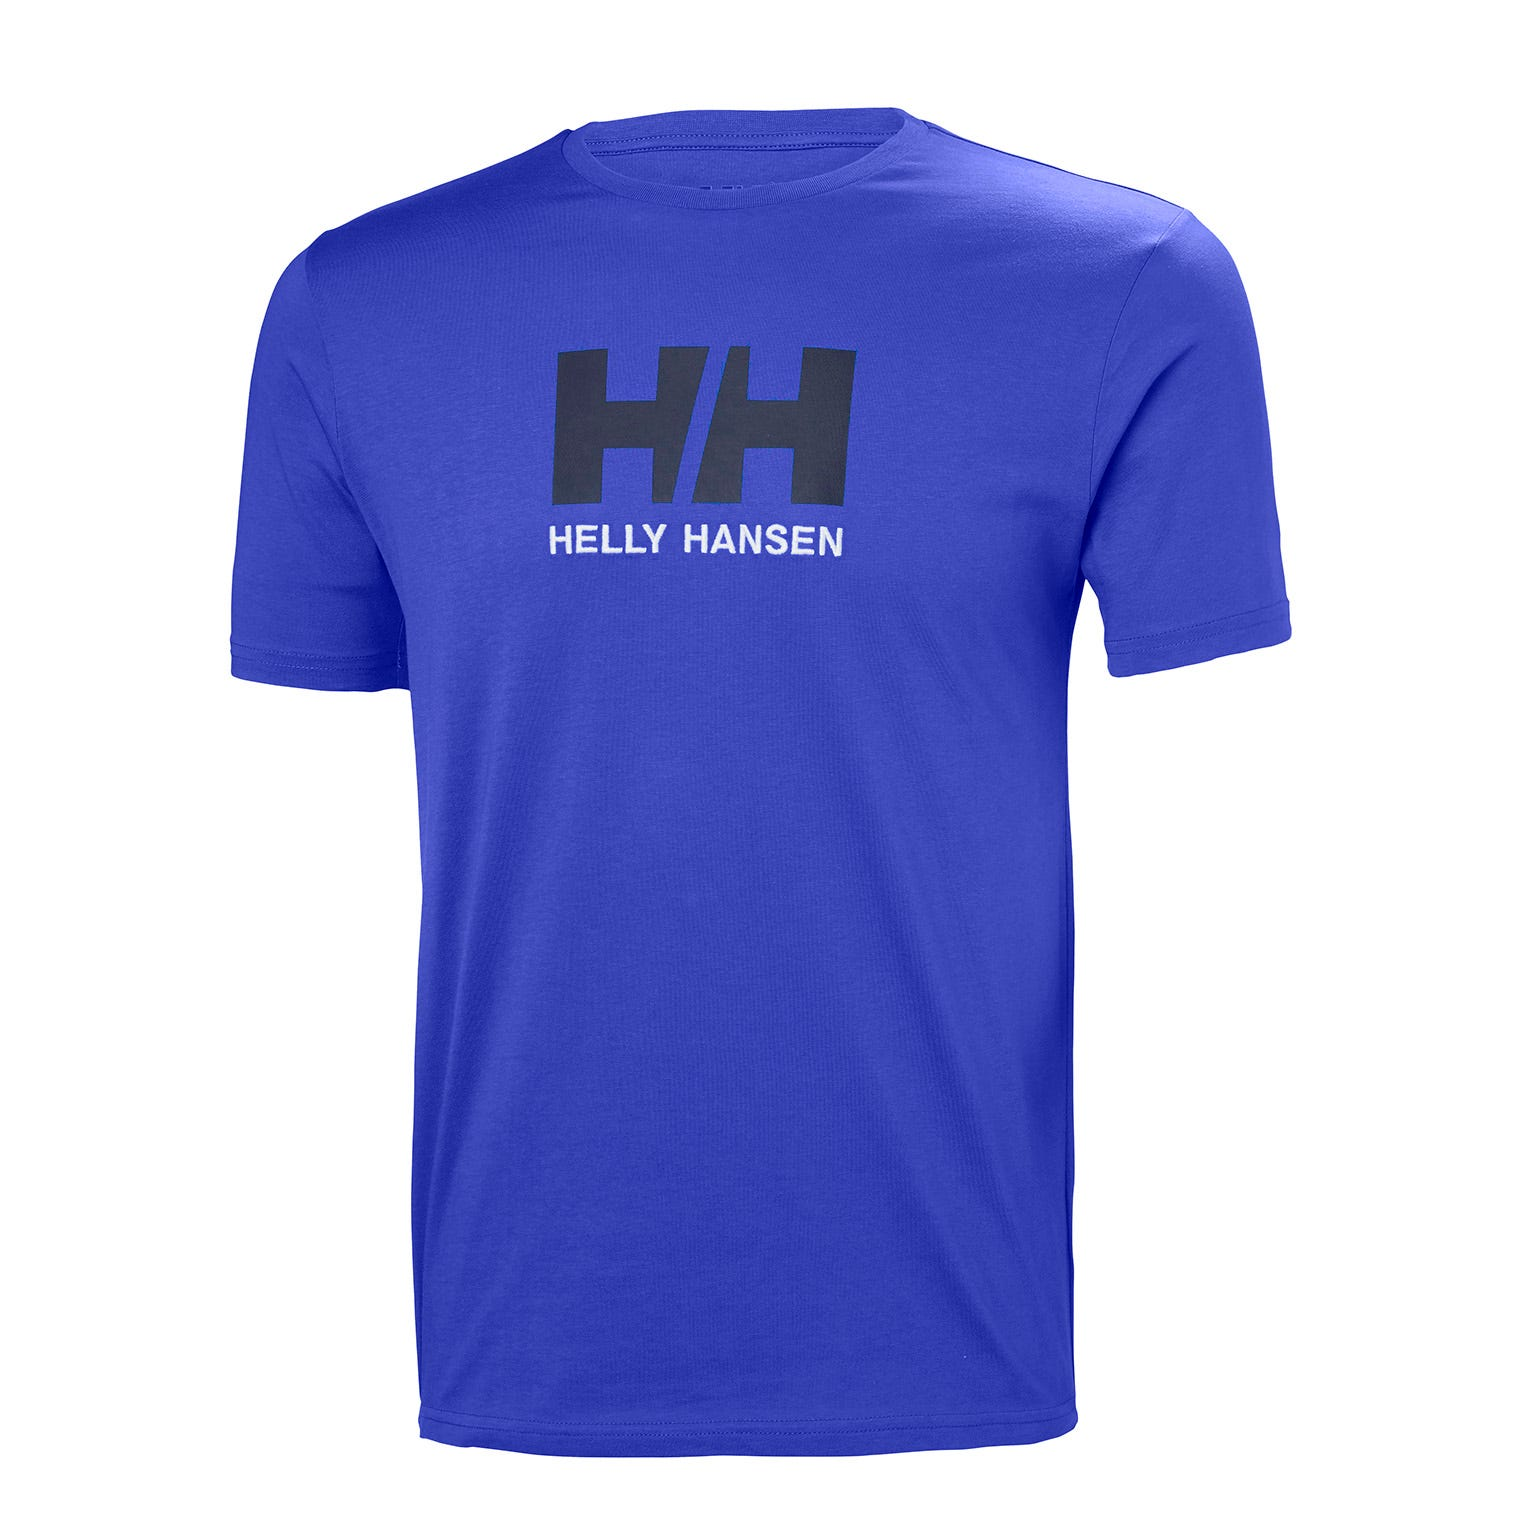 Helly Hansen Mens Hh Logo Tshirt Blue Xl